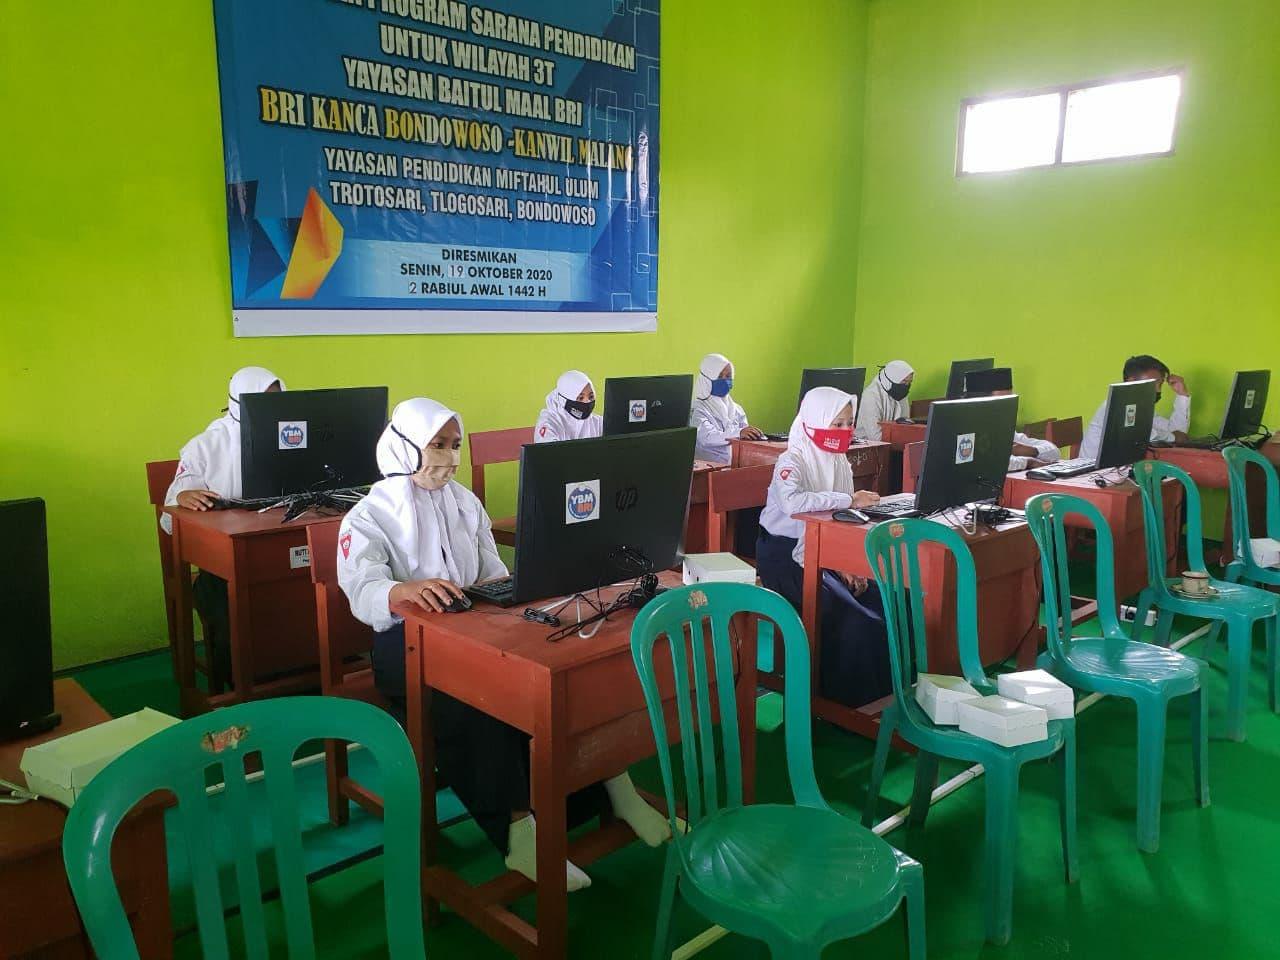 Komputer Pelajar Trotosari